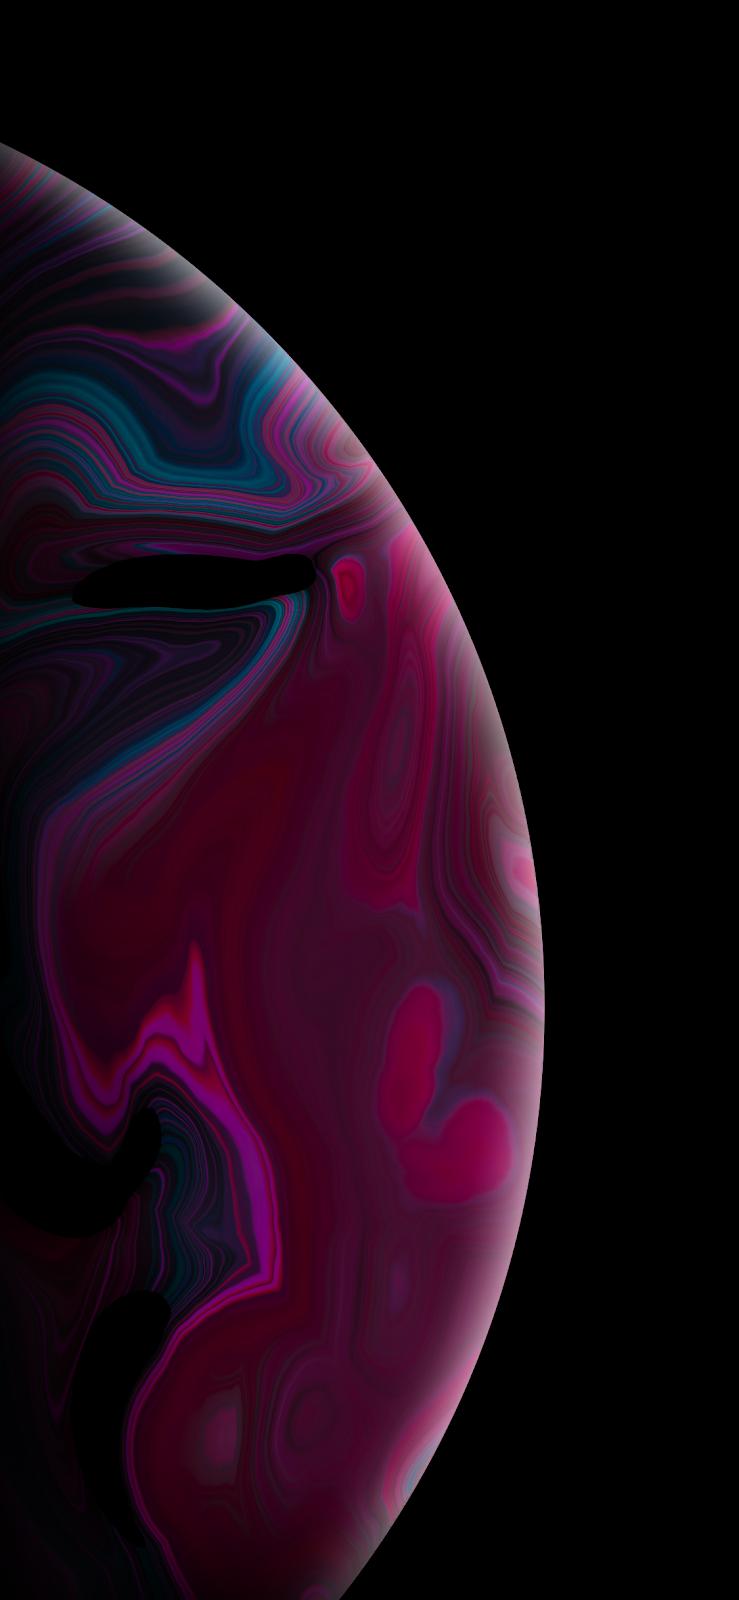 Purple Bubble (iPhone X)